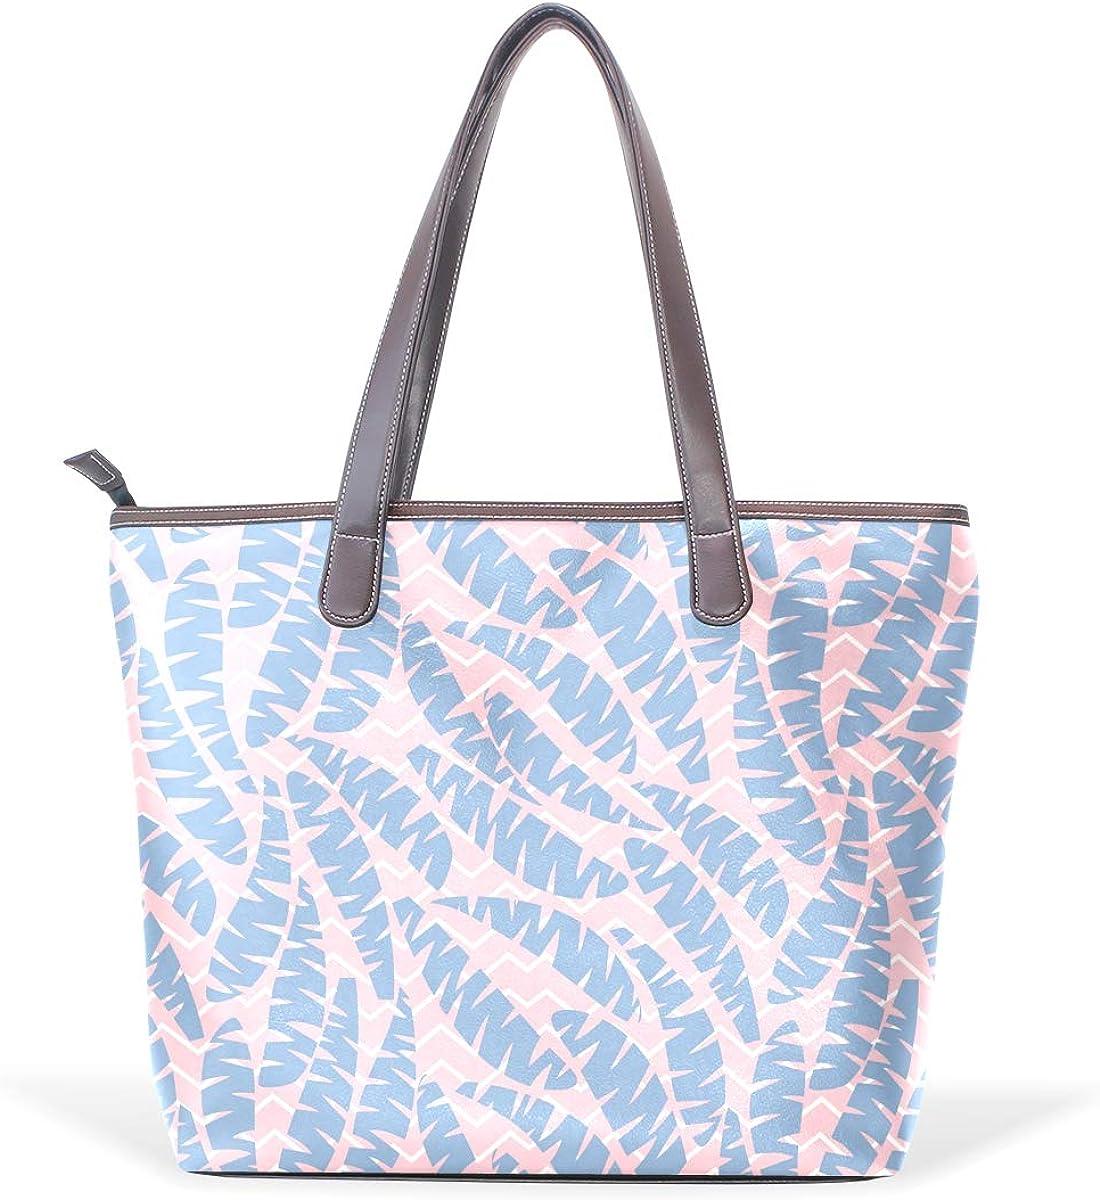 Pug Tropical Leaves Shirt Bag Womens Leather Handbag Shoulder Bag Satchel Handbags Leather Tote Purse Women Handle Handbags